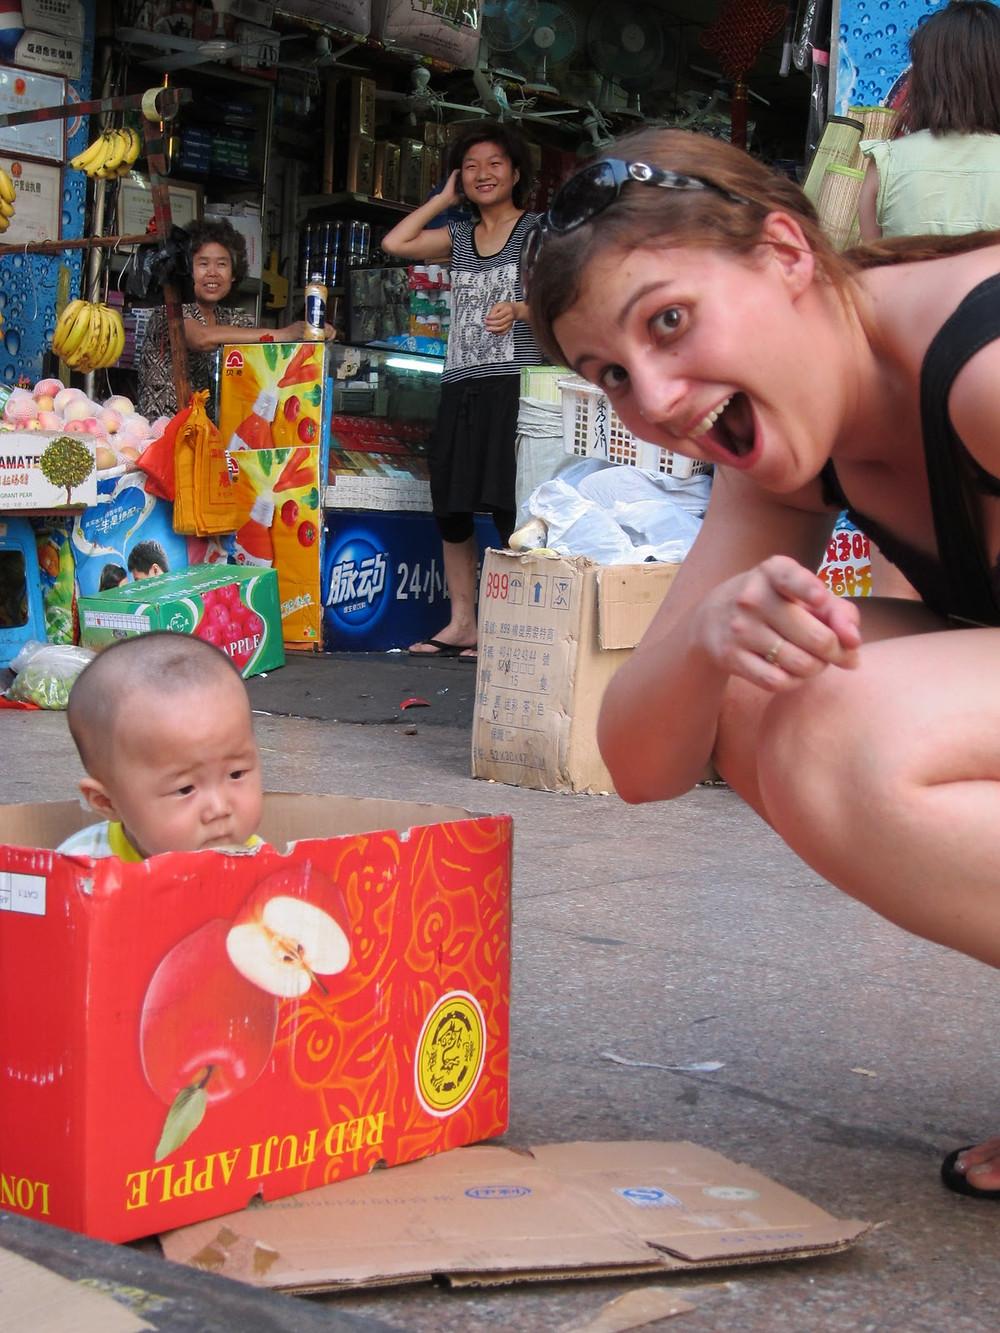 The newest fad: Apple Box Babysitting - Copyright EB Words